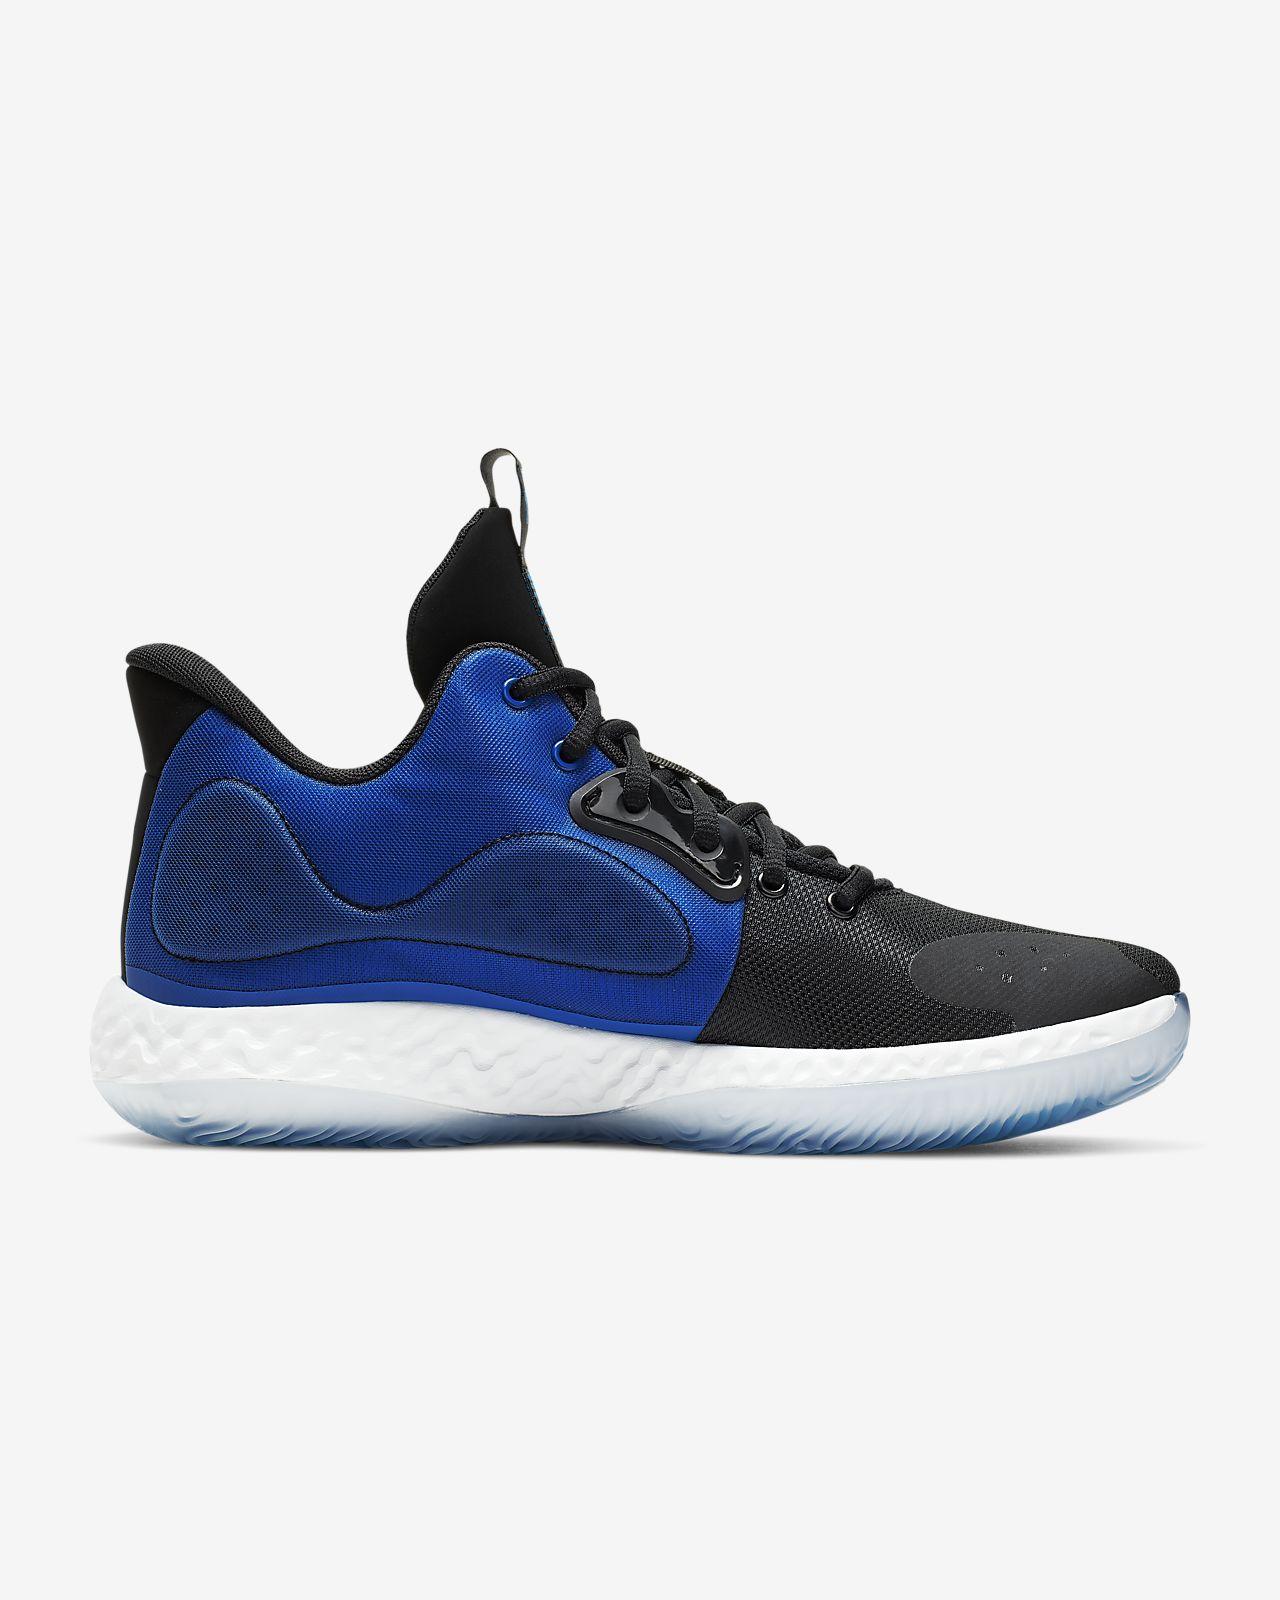 Nike Kids Nike Kids KD Trey 5 VI (Big Kid) (BlackWhiteBlack) Boys Shoes from Zappos | Shop